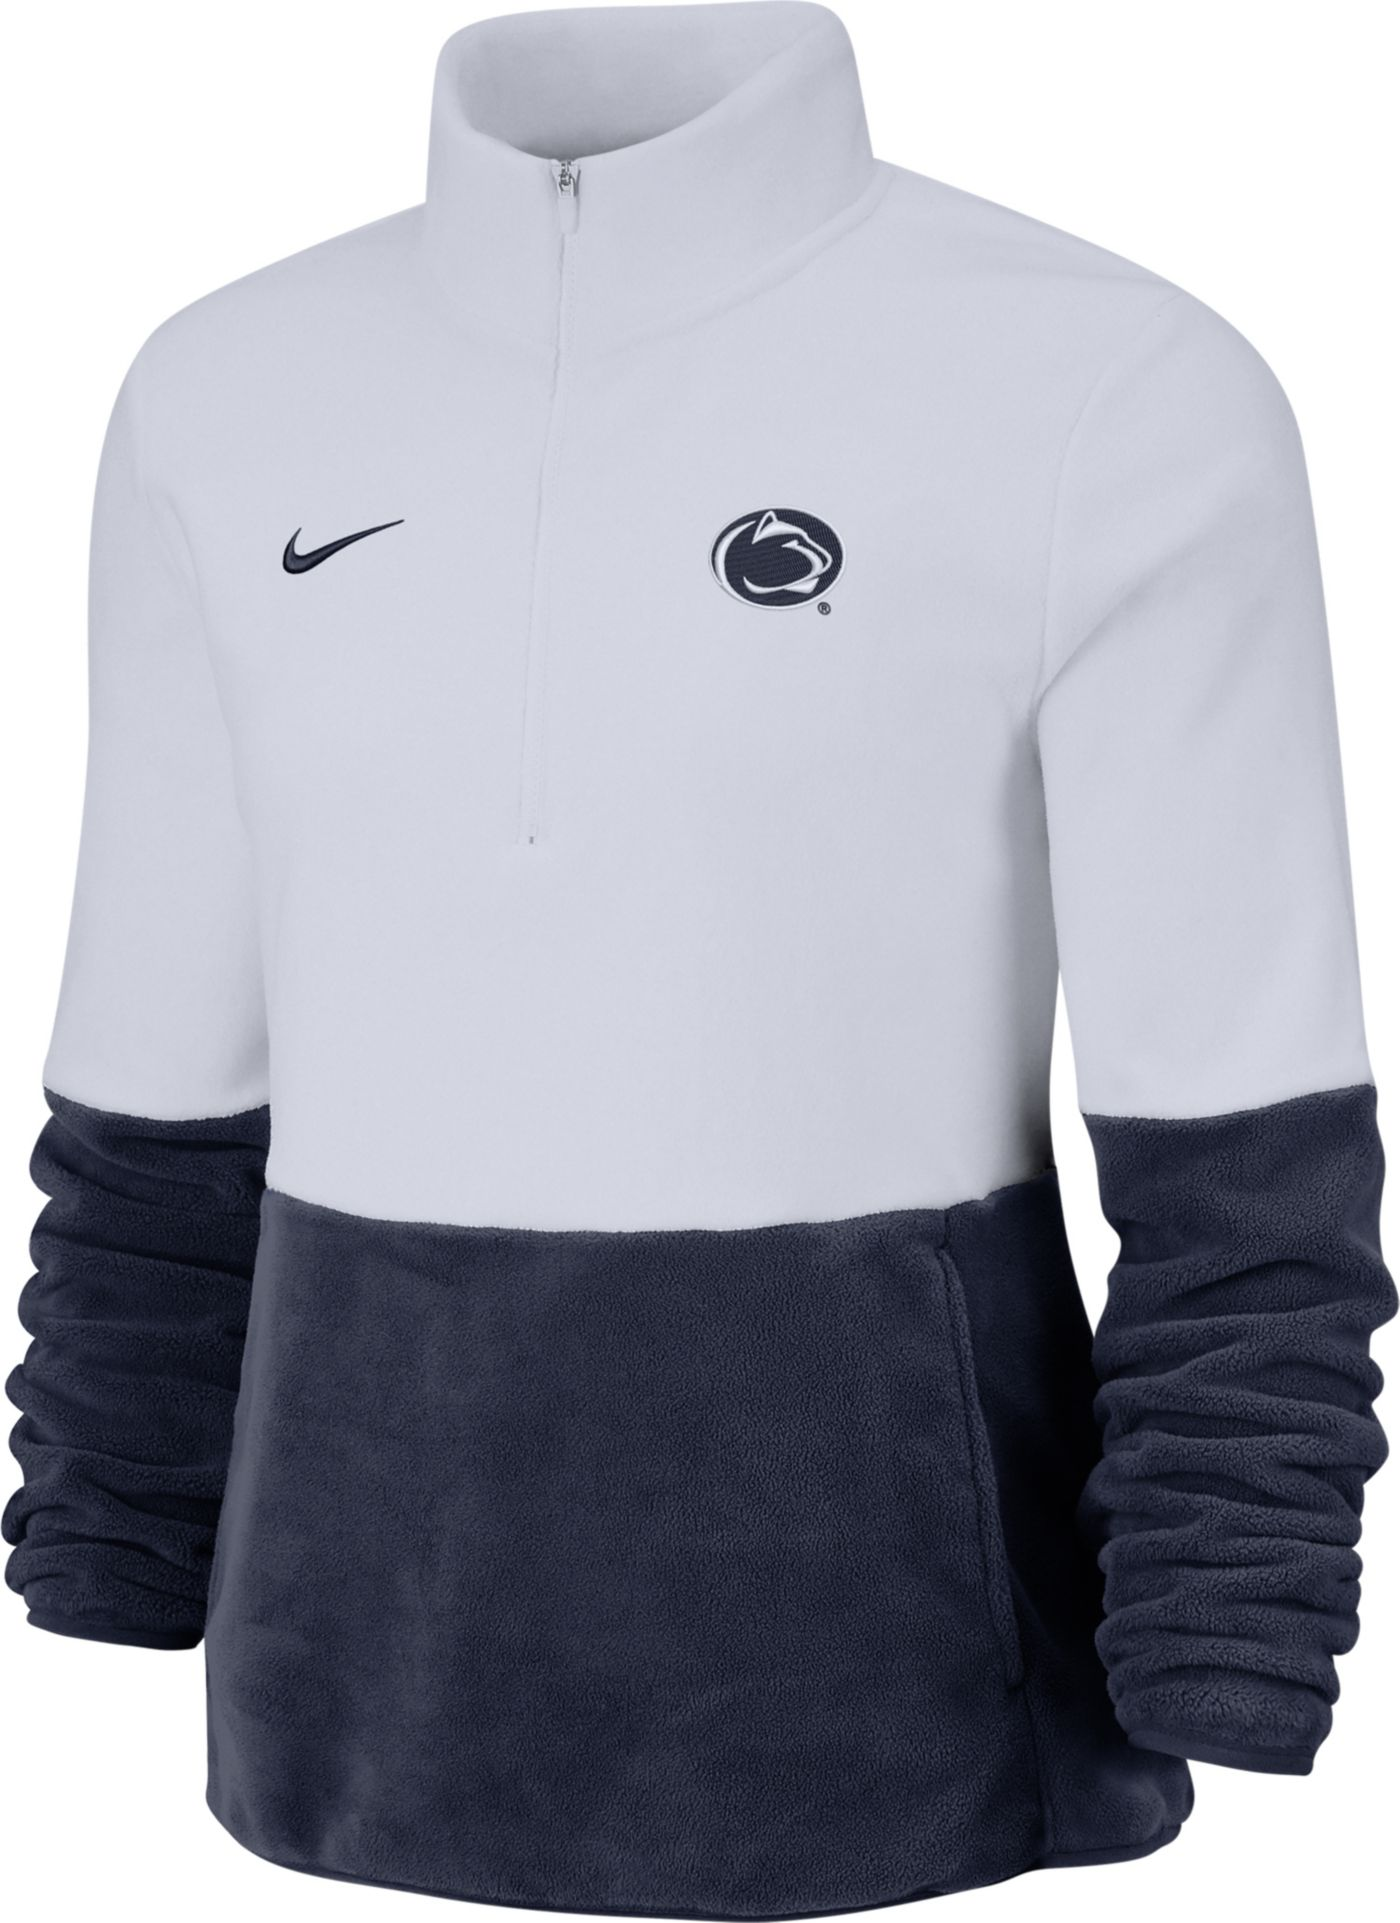 Nike Women's Penn State Nittany Lions Cozy Therma White Half-Zip Fleece